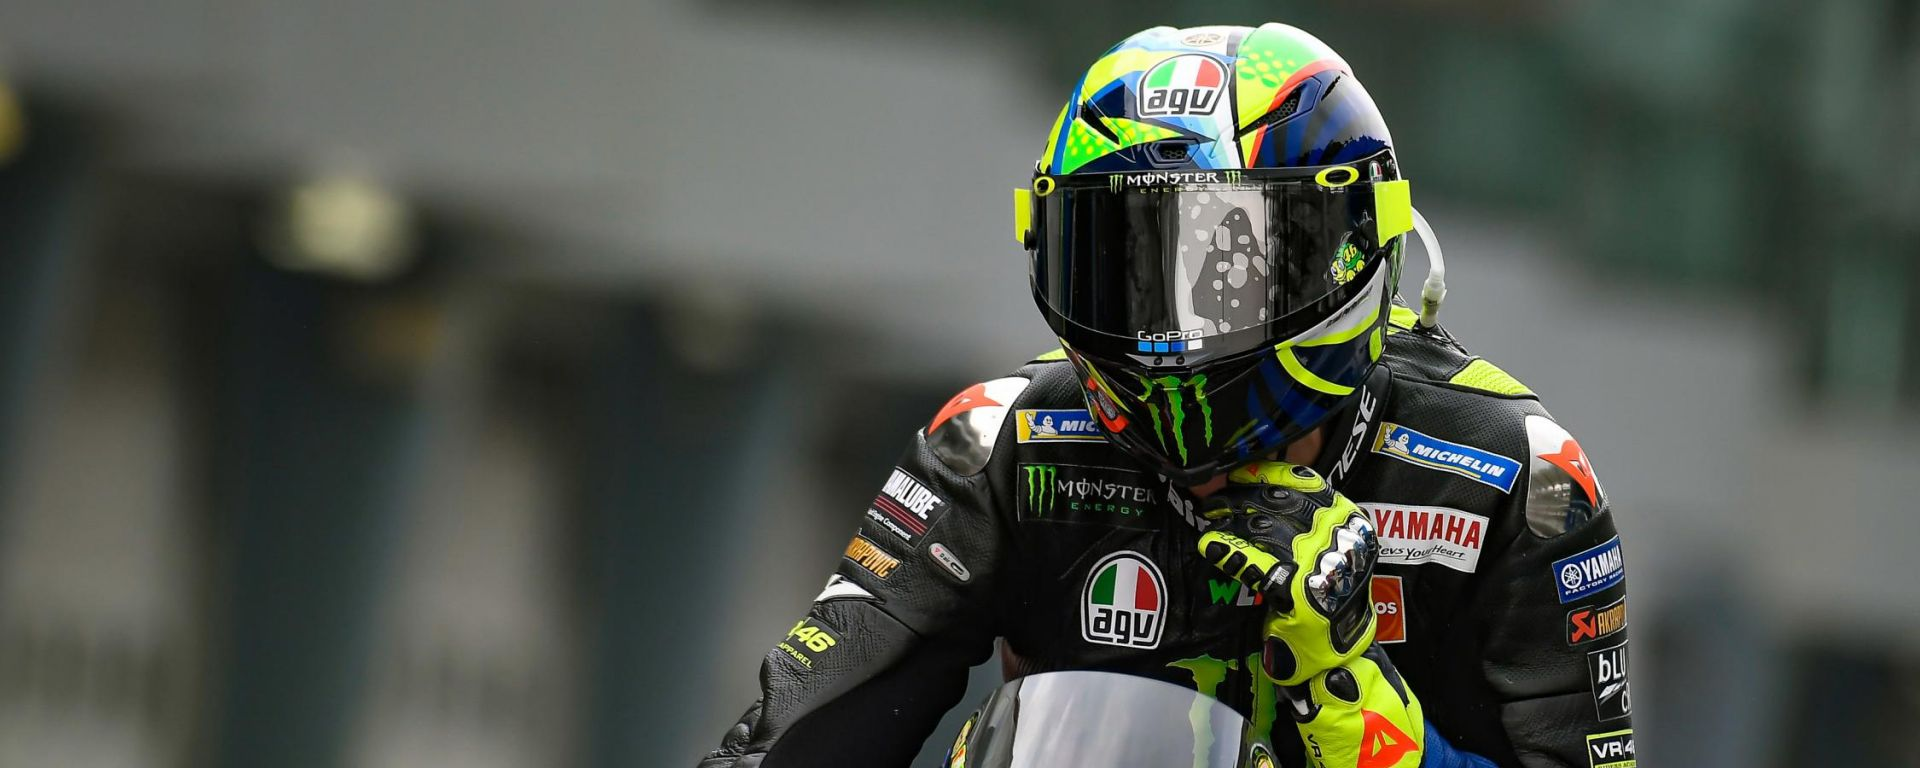 MotoGP 2020, test Sepang, Valentino Rossi (Yamaha)